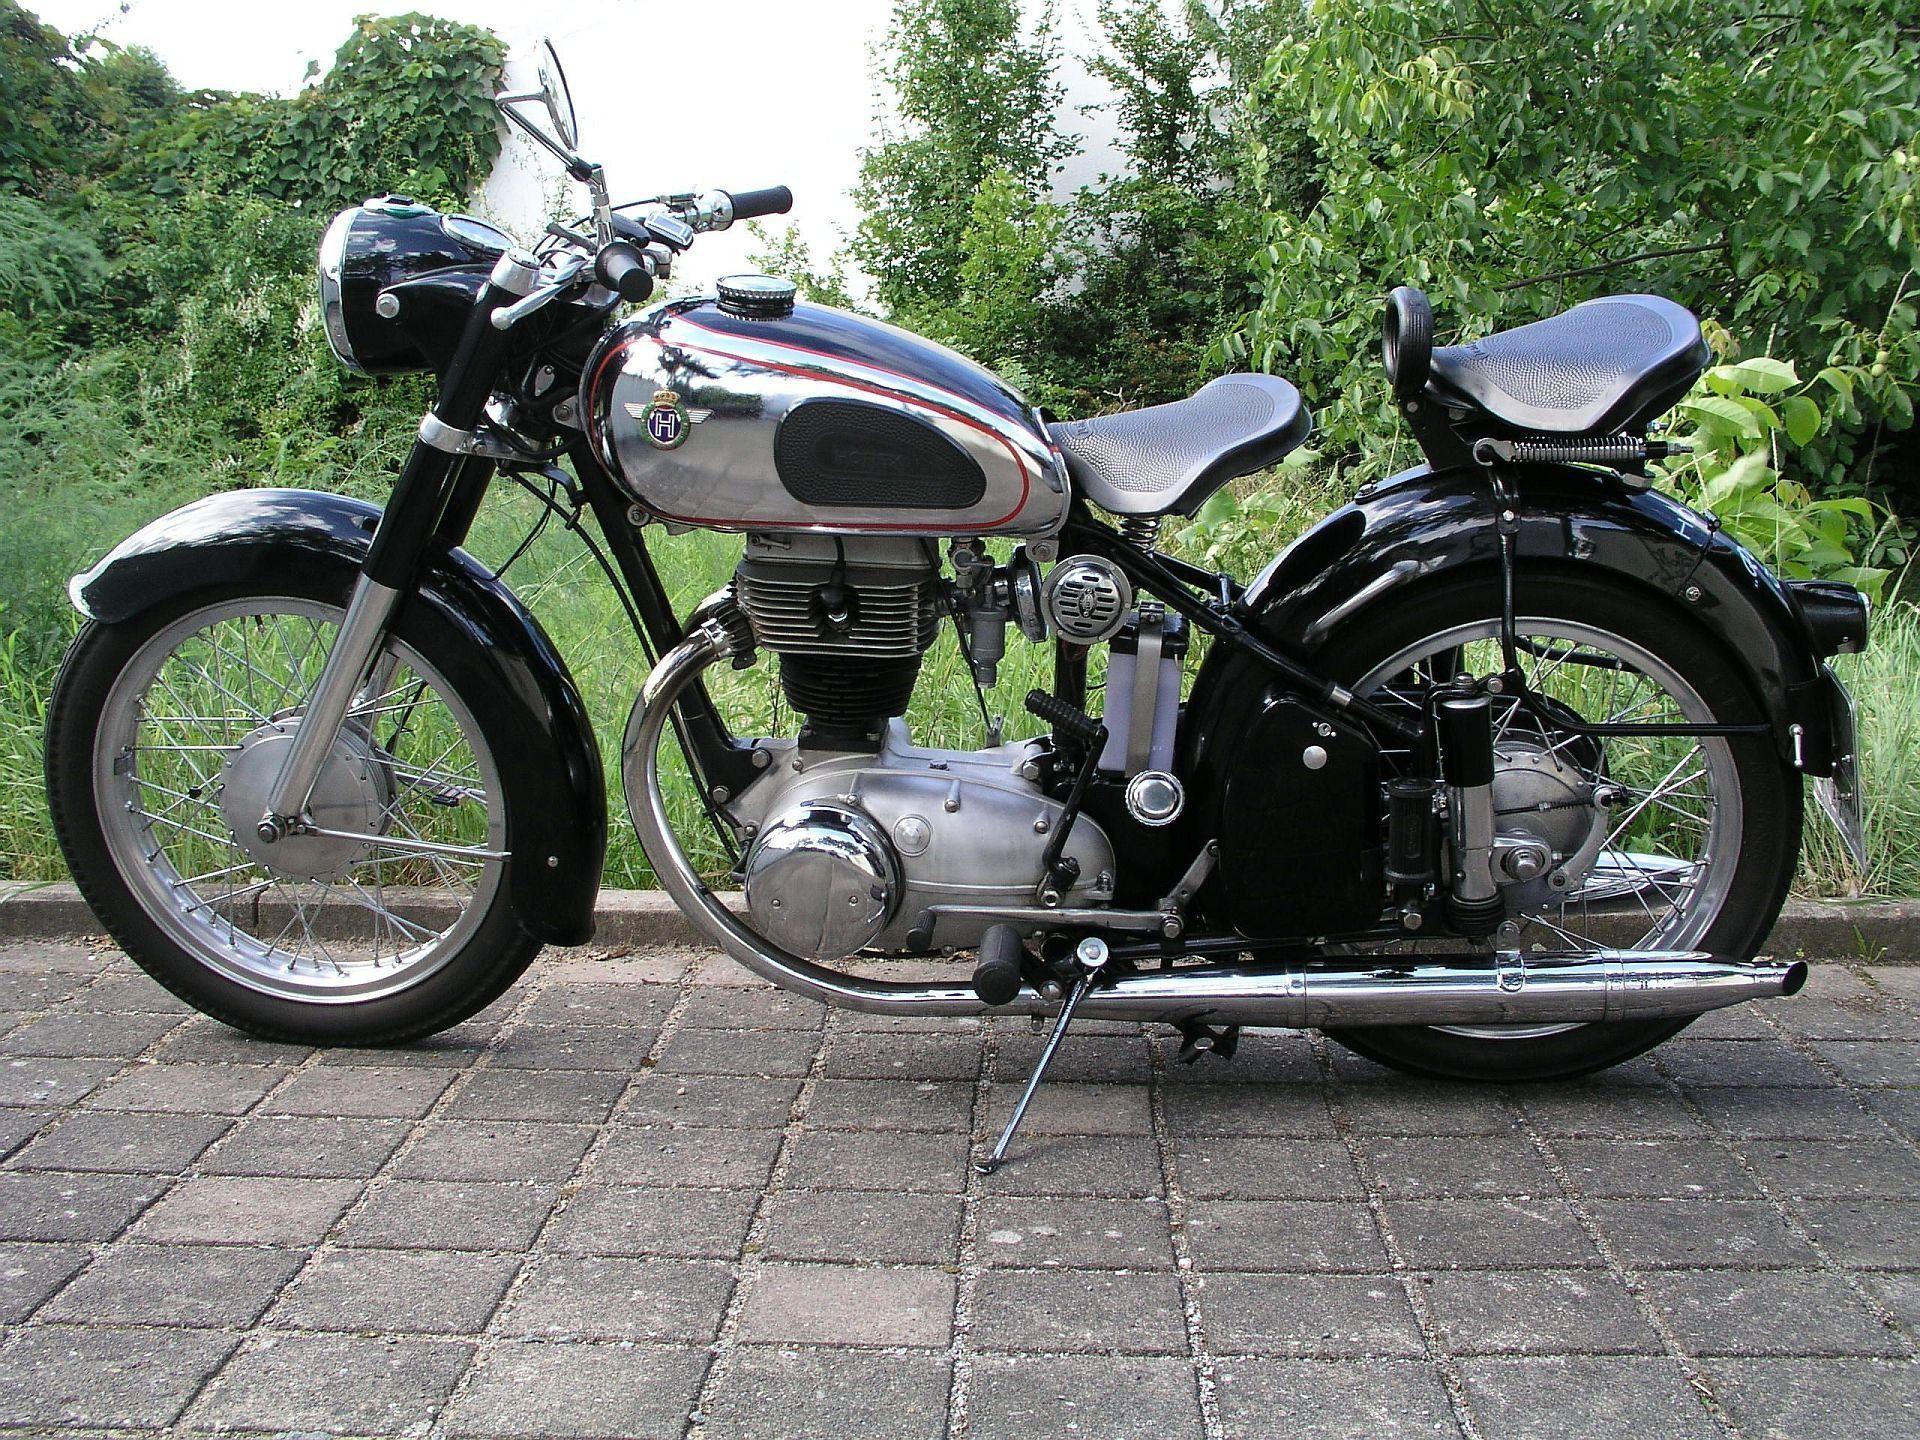 horex google search motos motorcycle motorbikes und. Black Bedroom Furniture Sets. Home Design Ideas